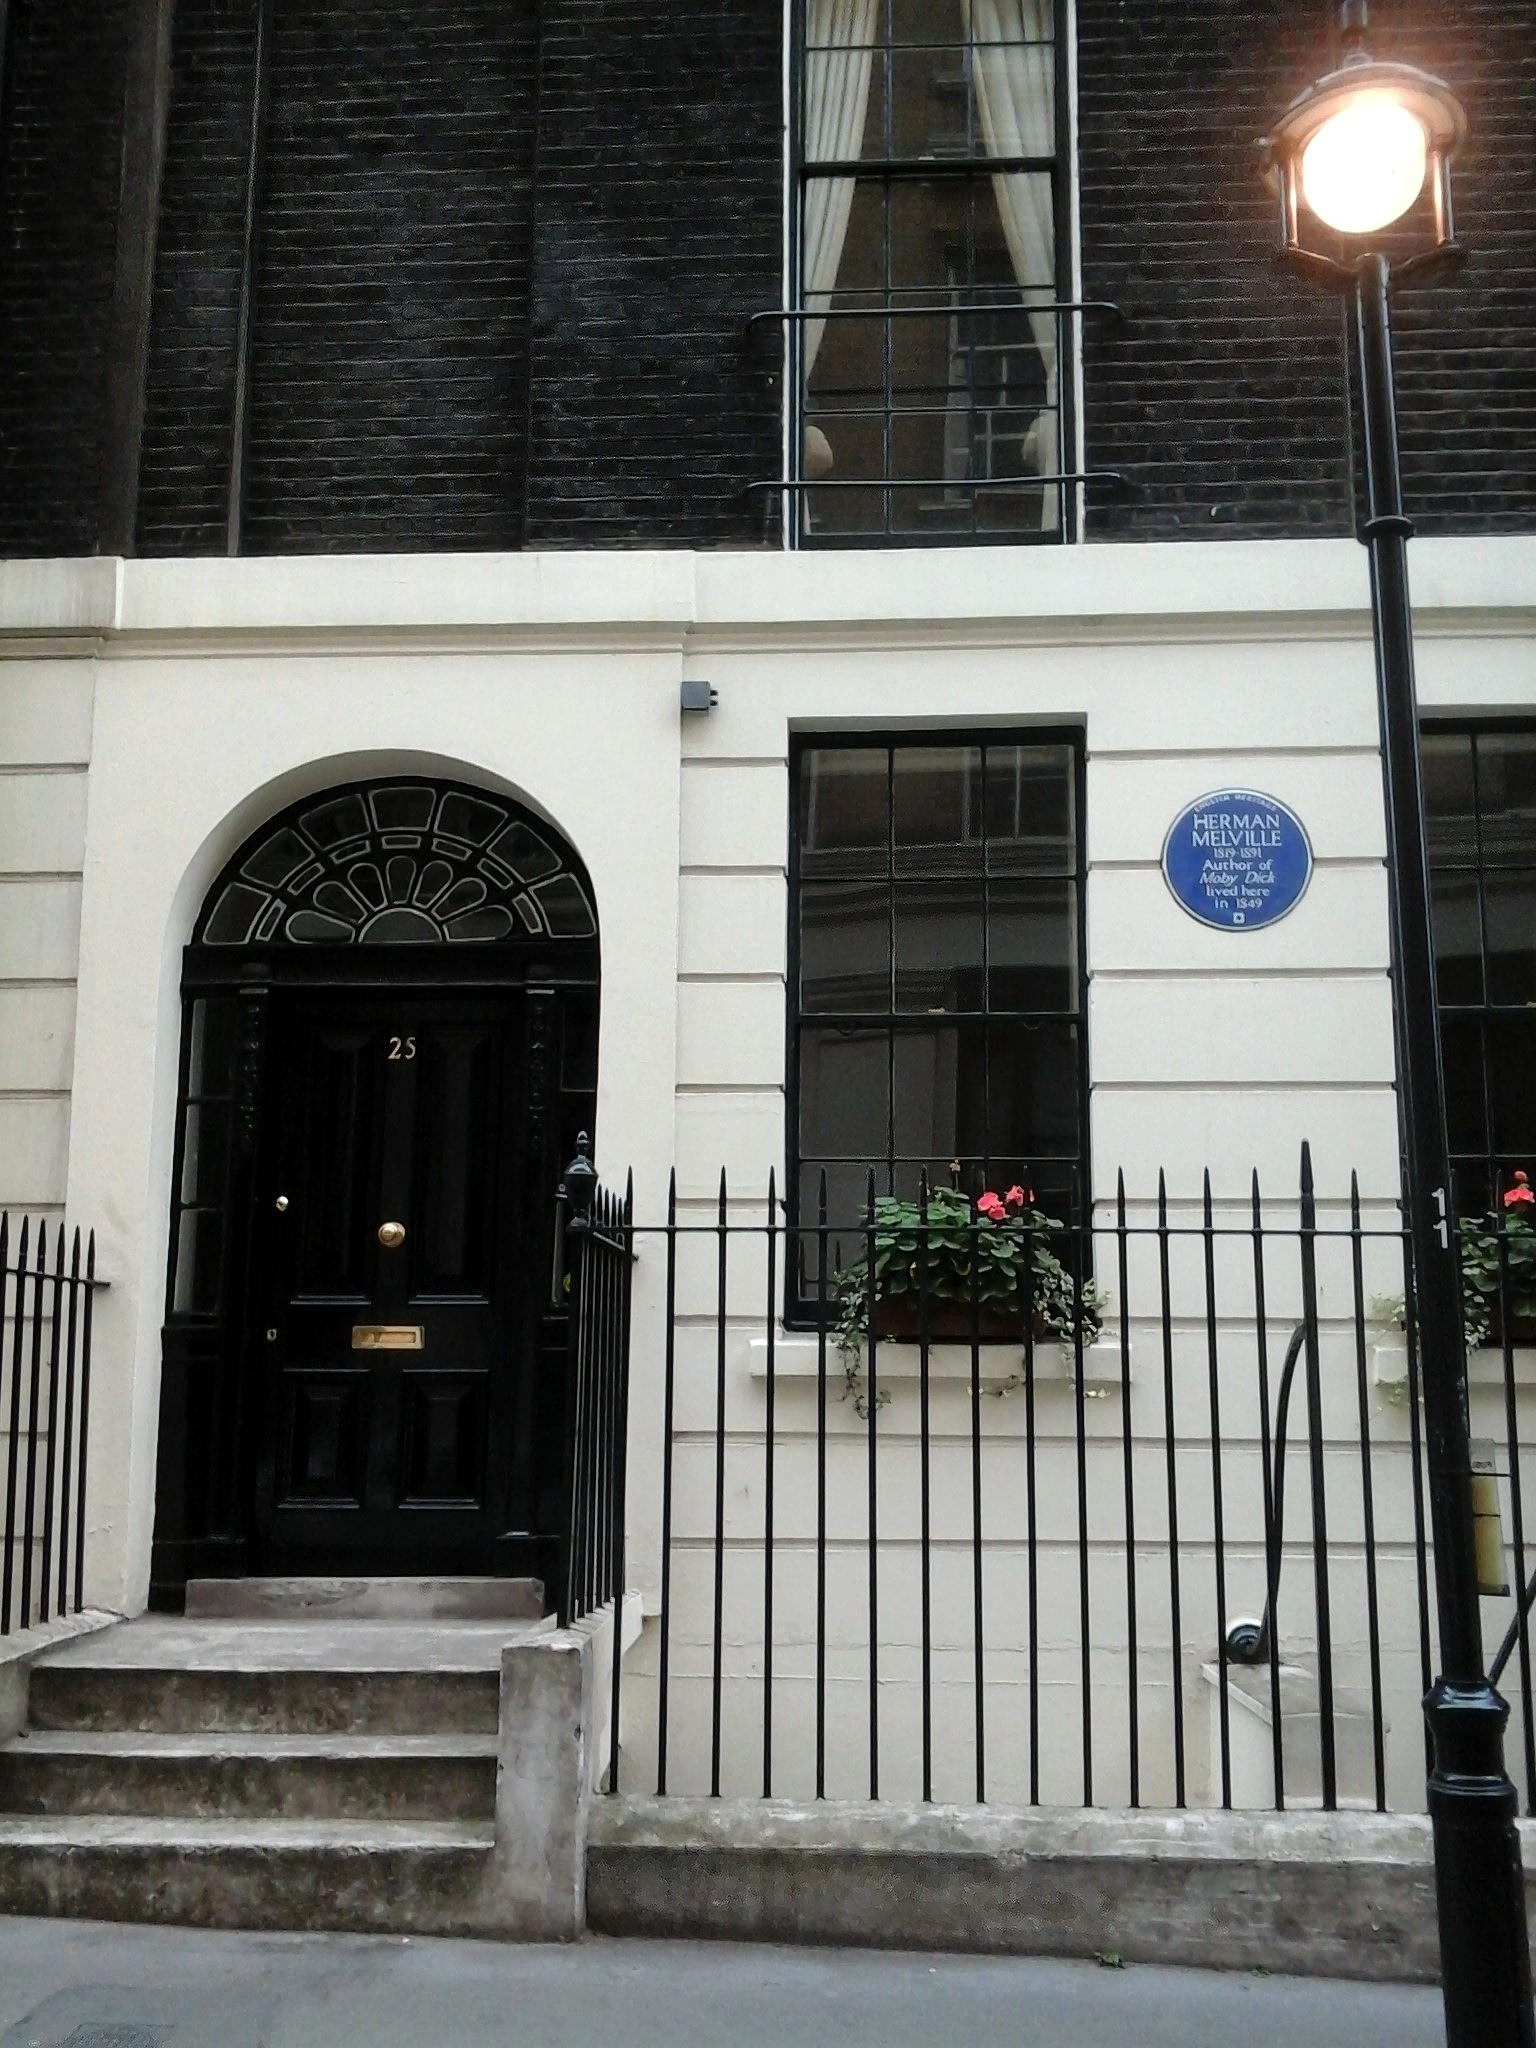 Open House London 2014. by marisa.alcaraz